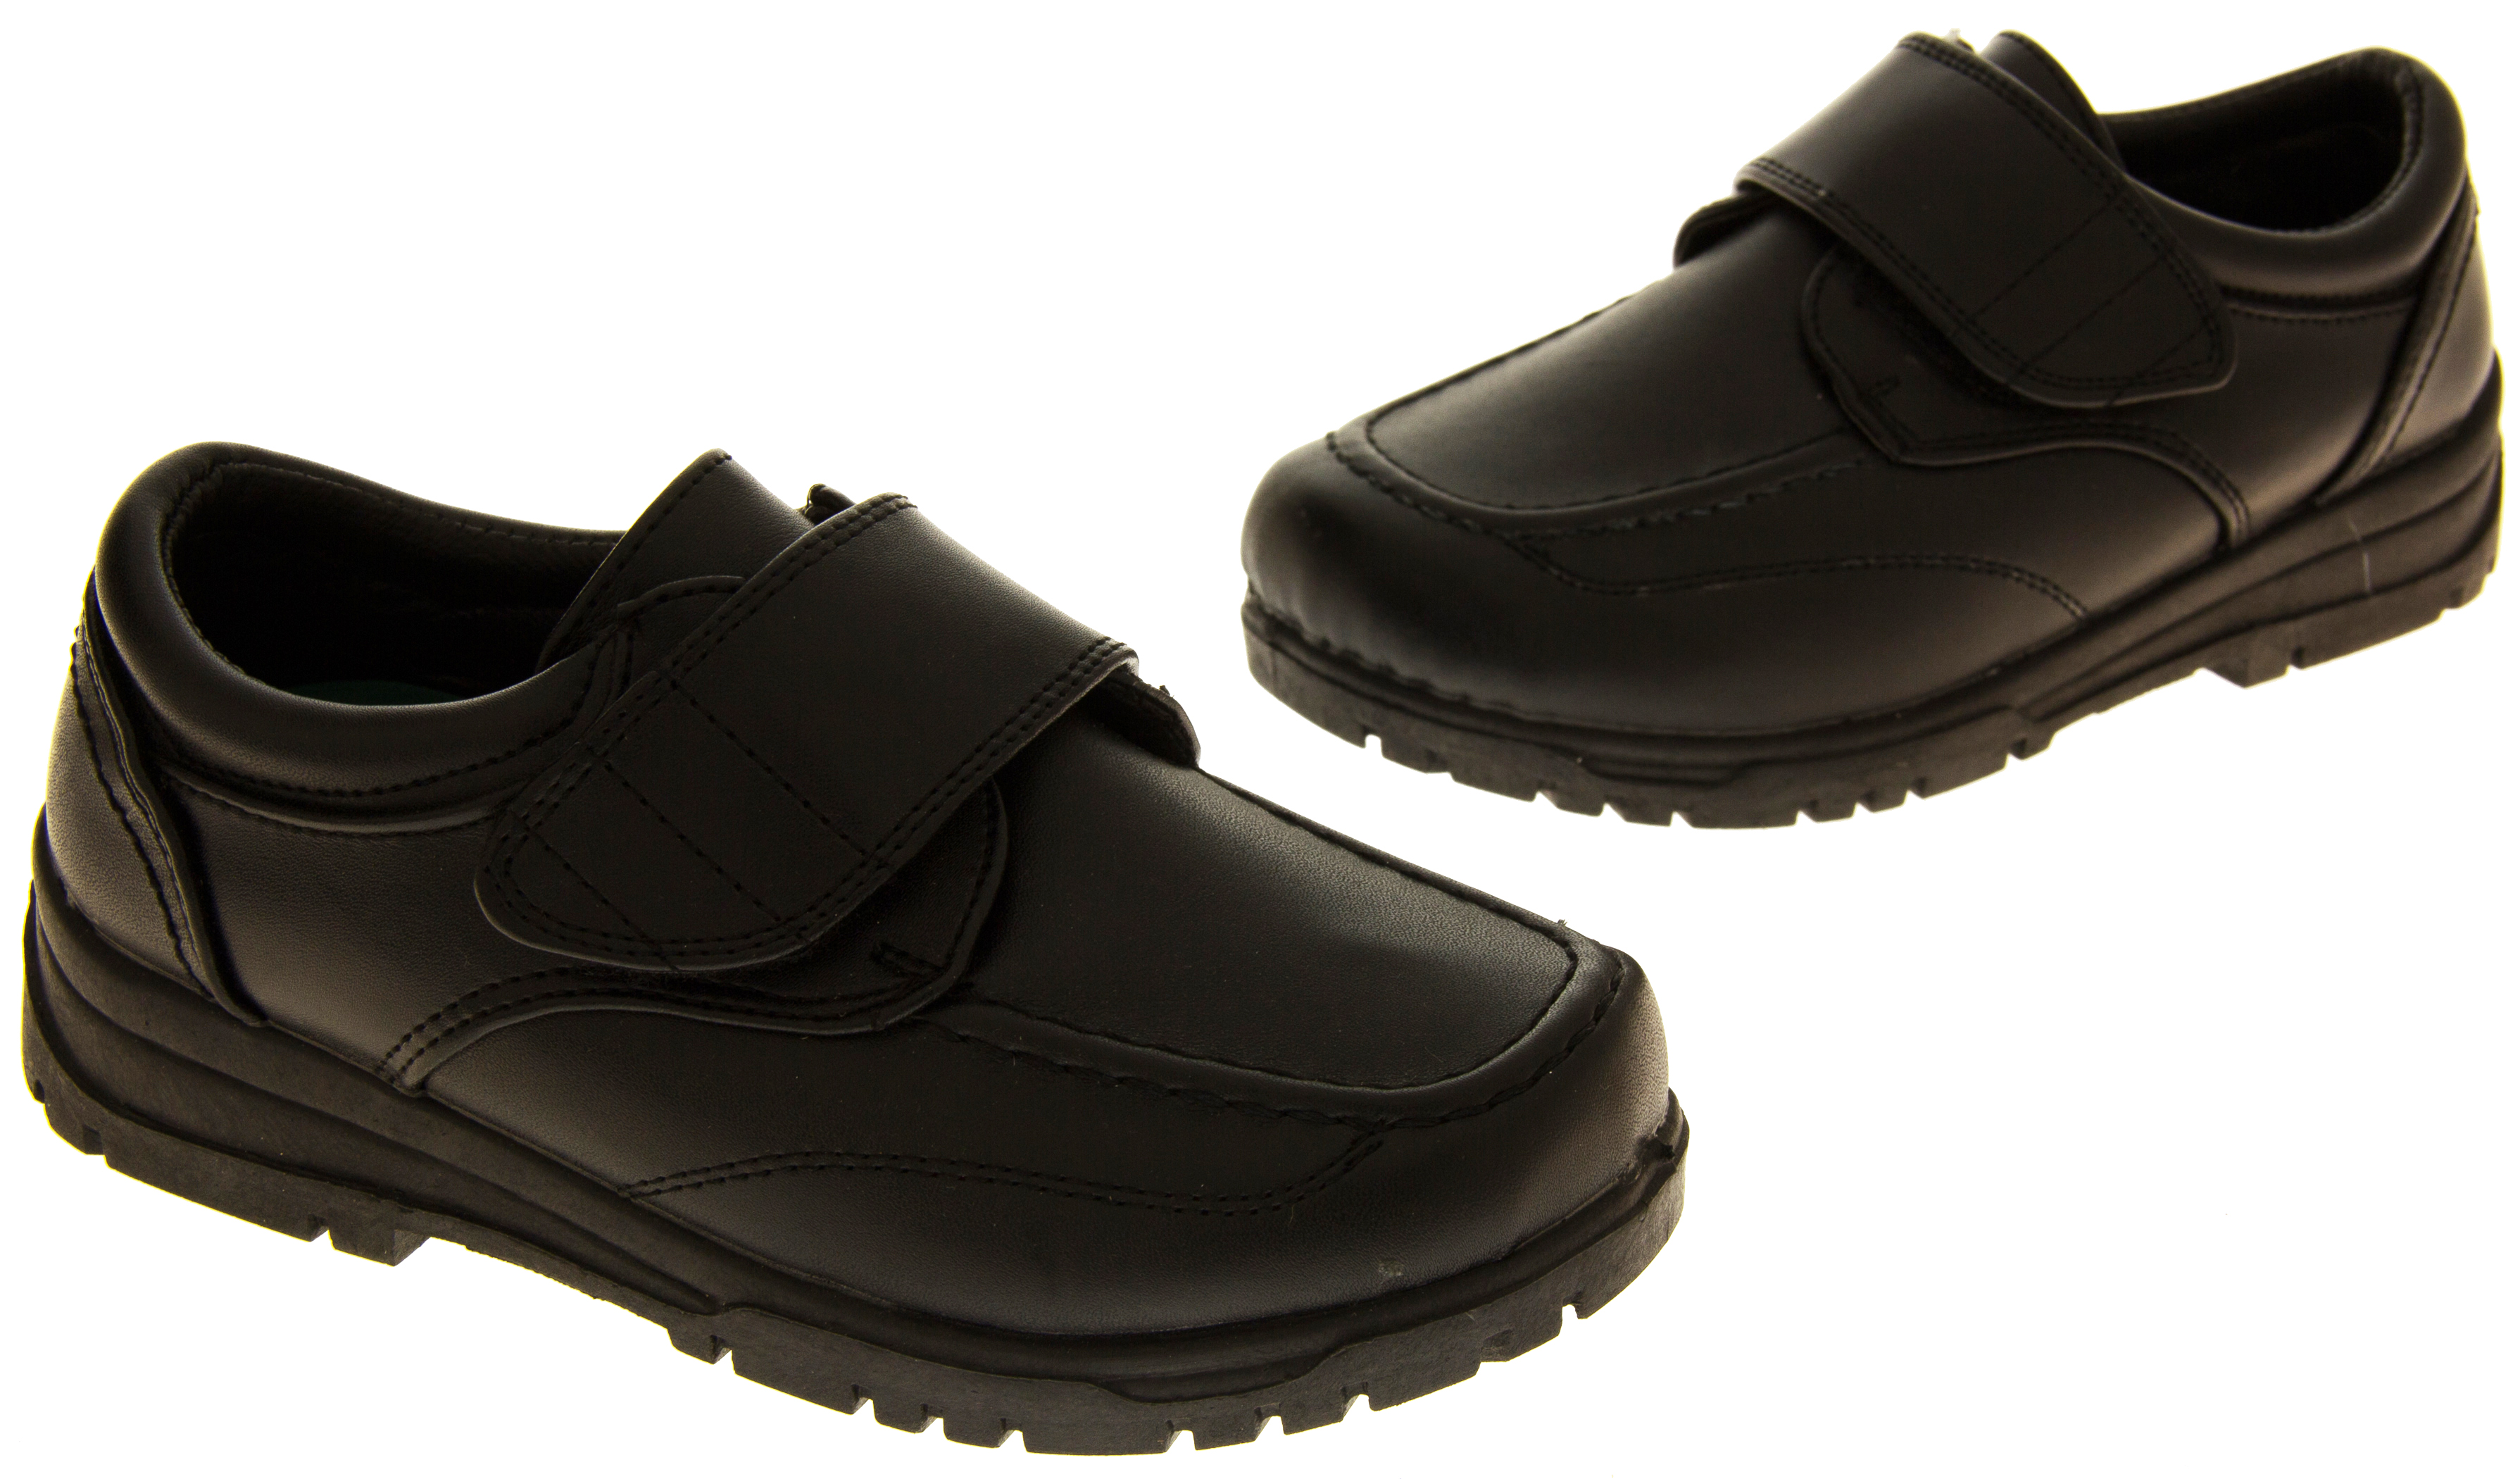 Best Scuff Resistant School Shoes